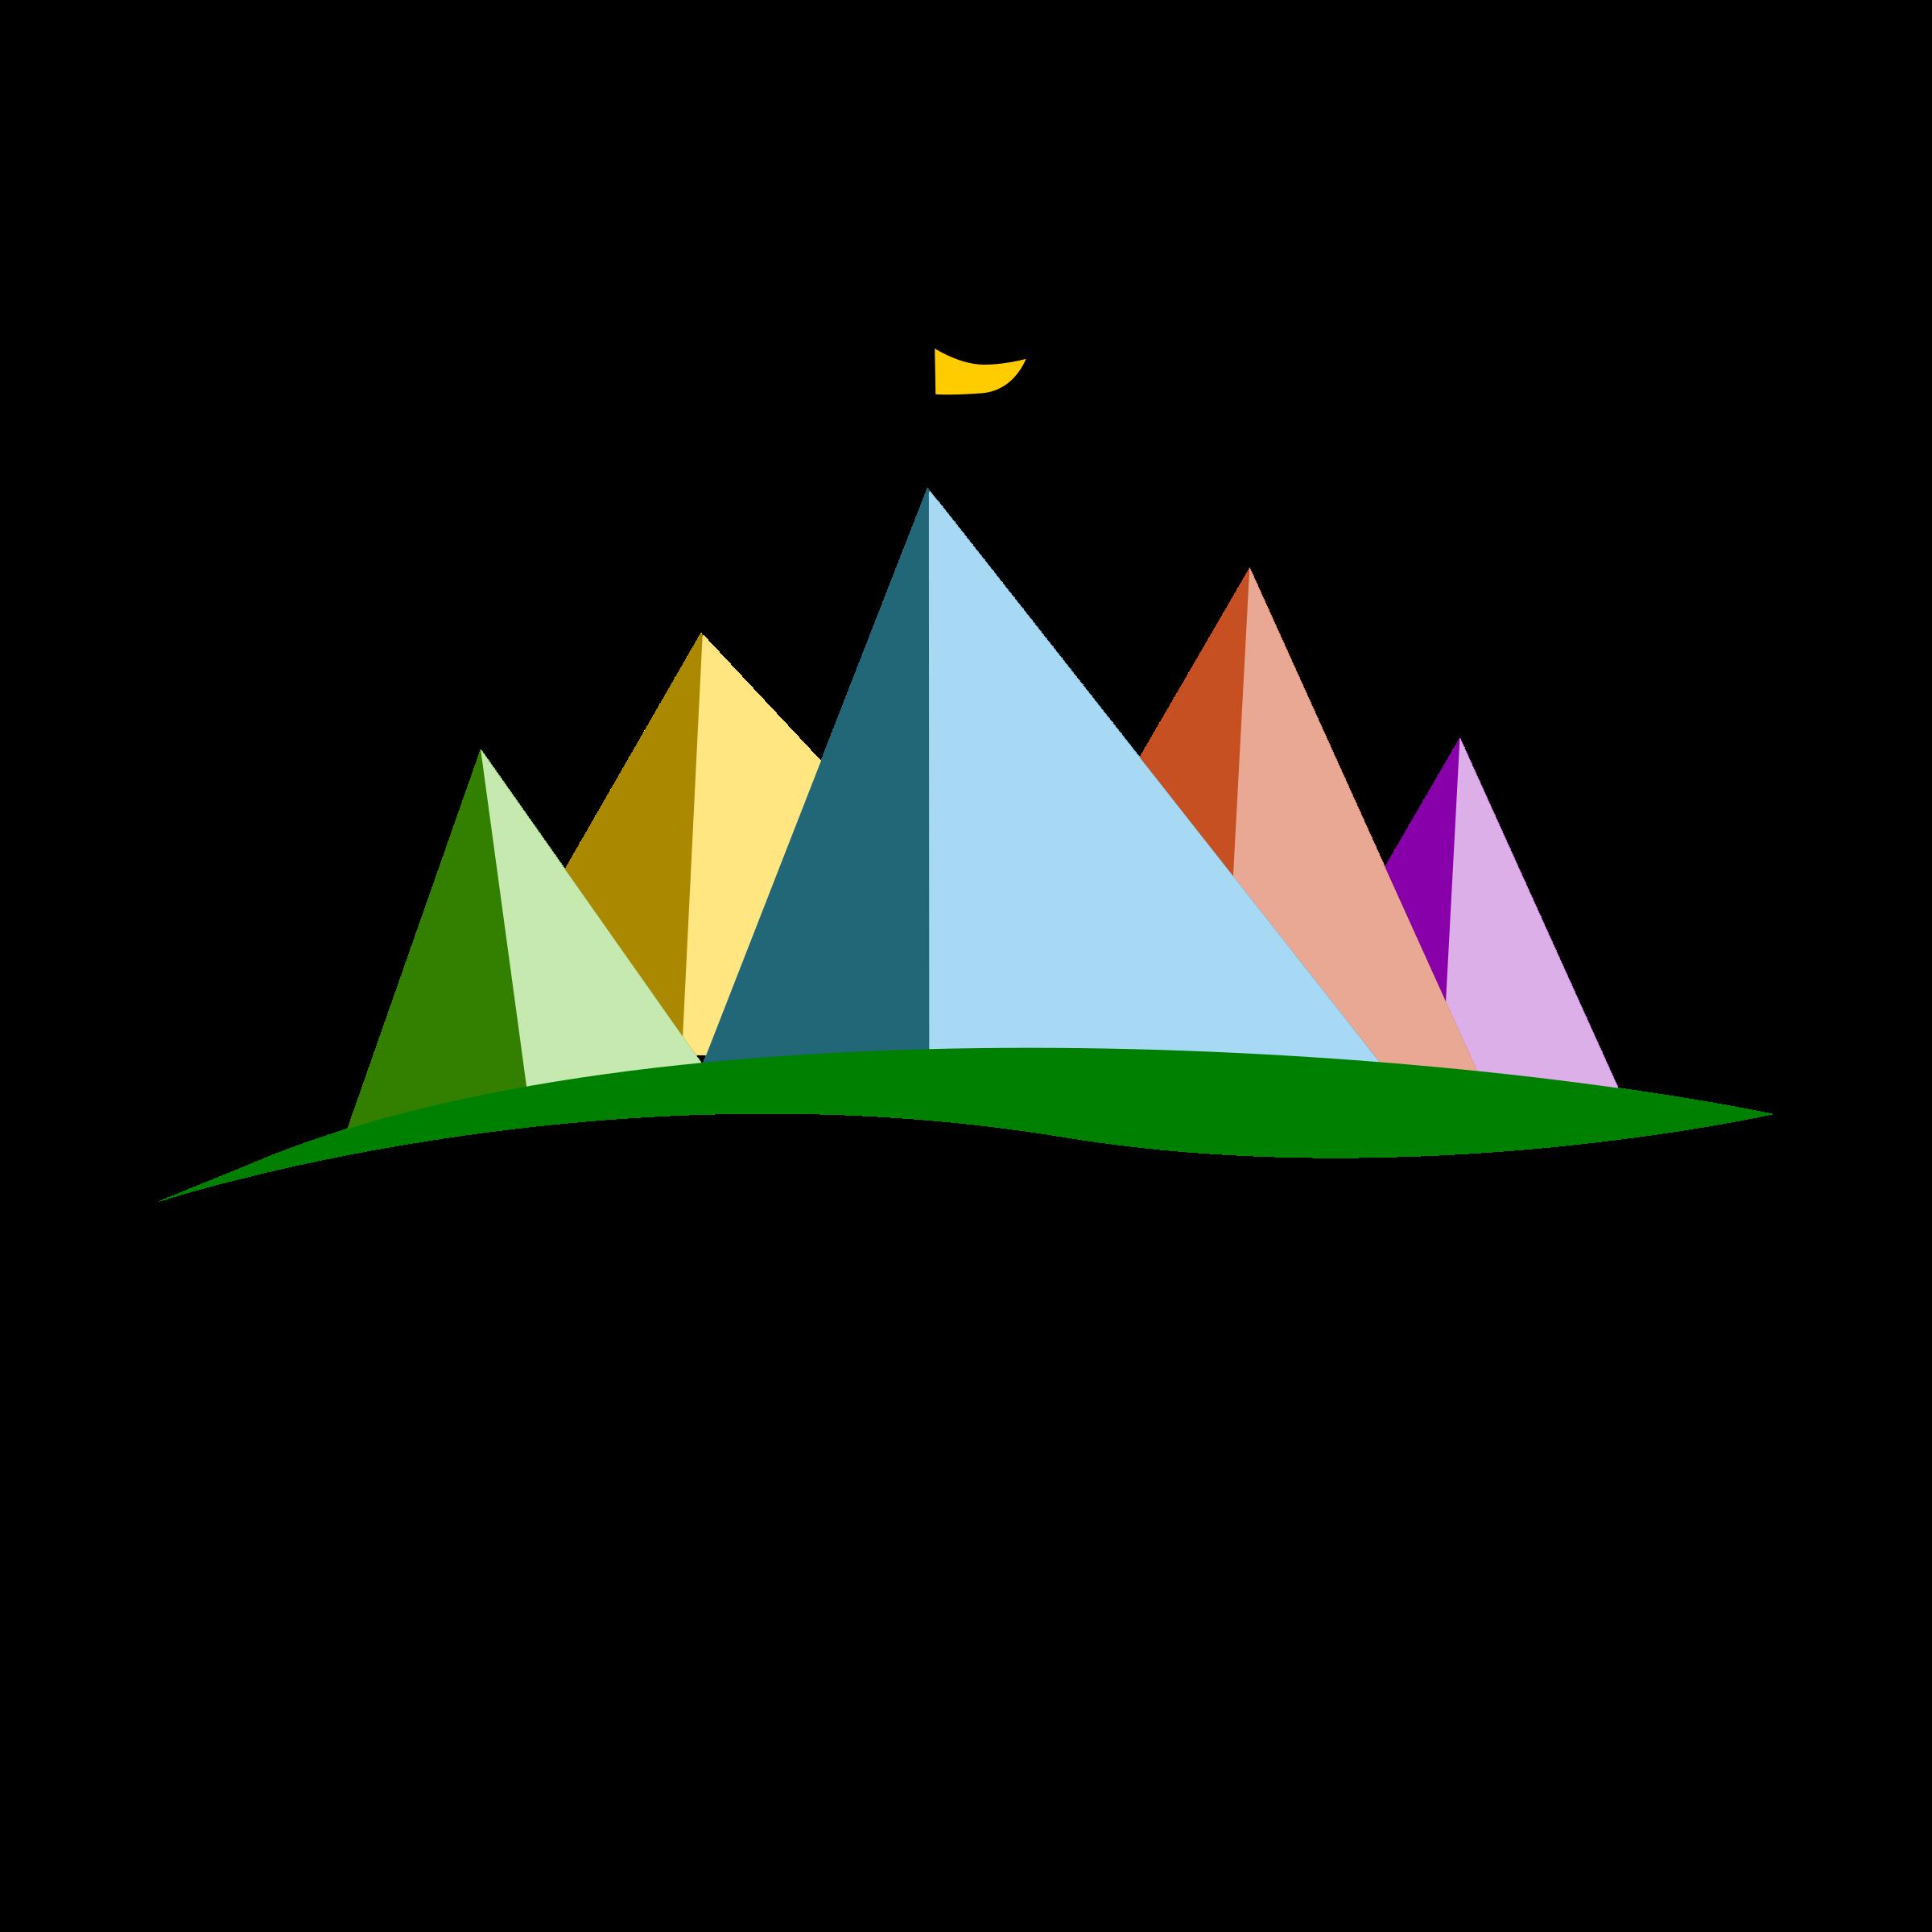 Download Free png Camp Png.